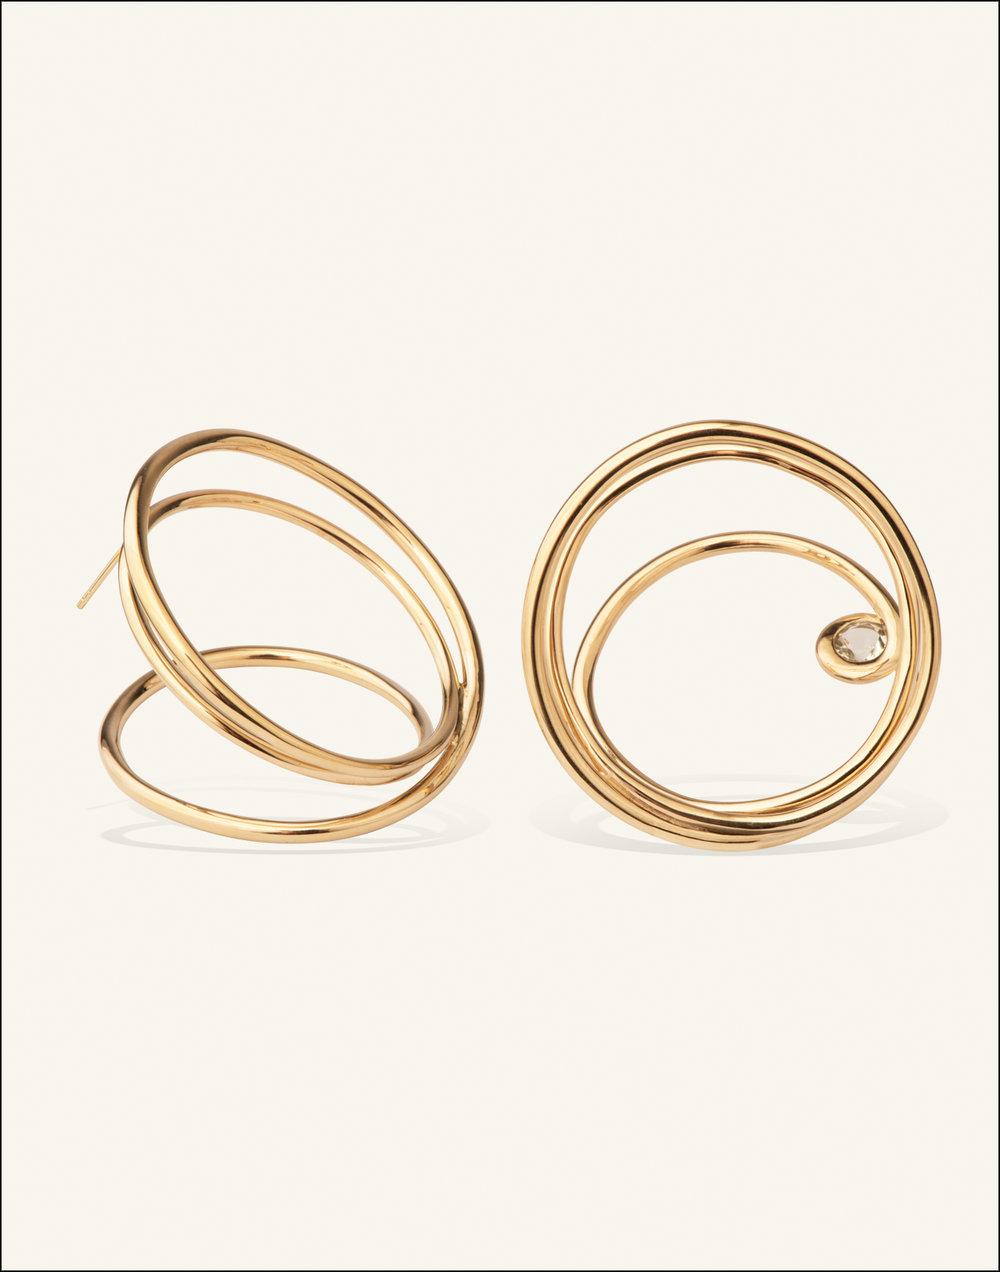 Completedworks-Earrings-Gold-Vermeil-The-Idea-of-Order-1-1.jpg